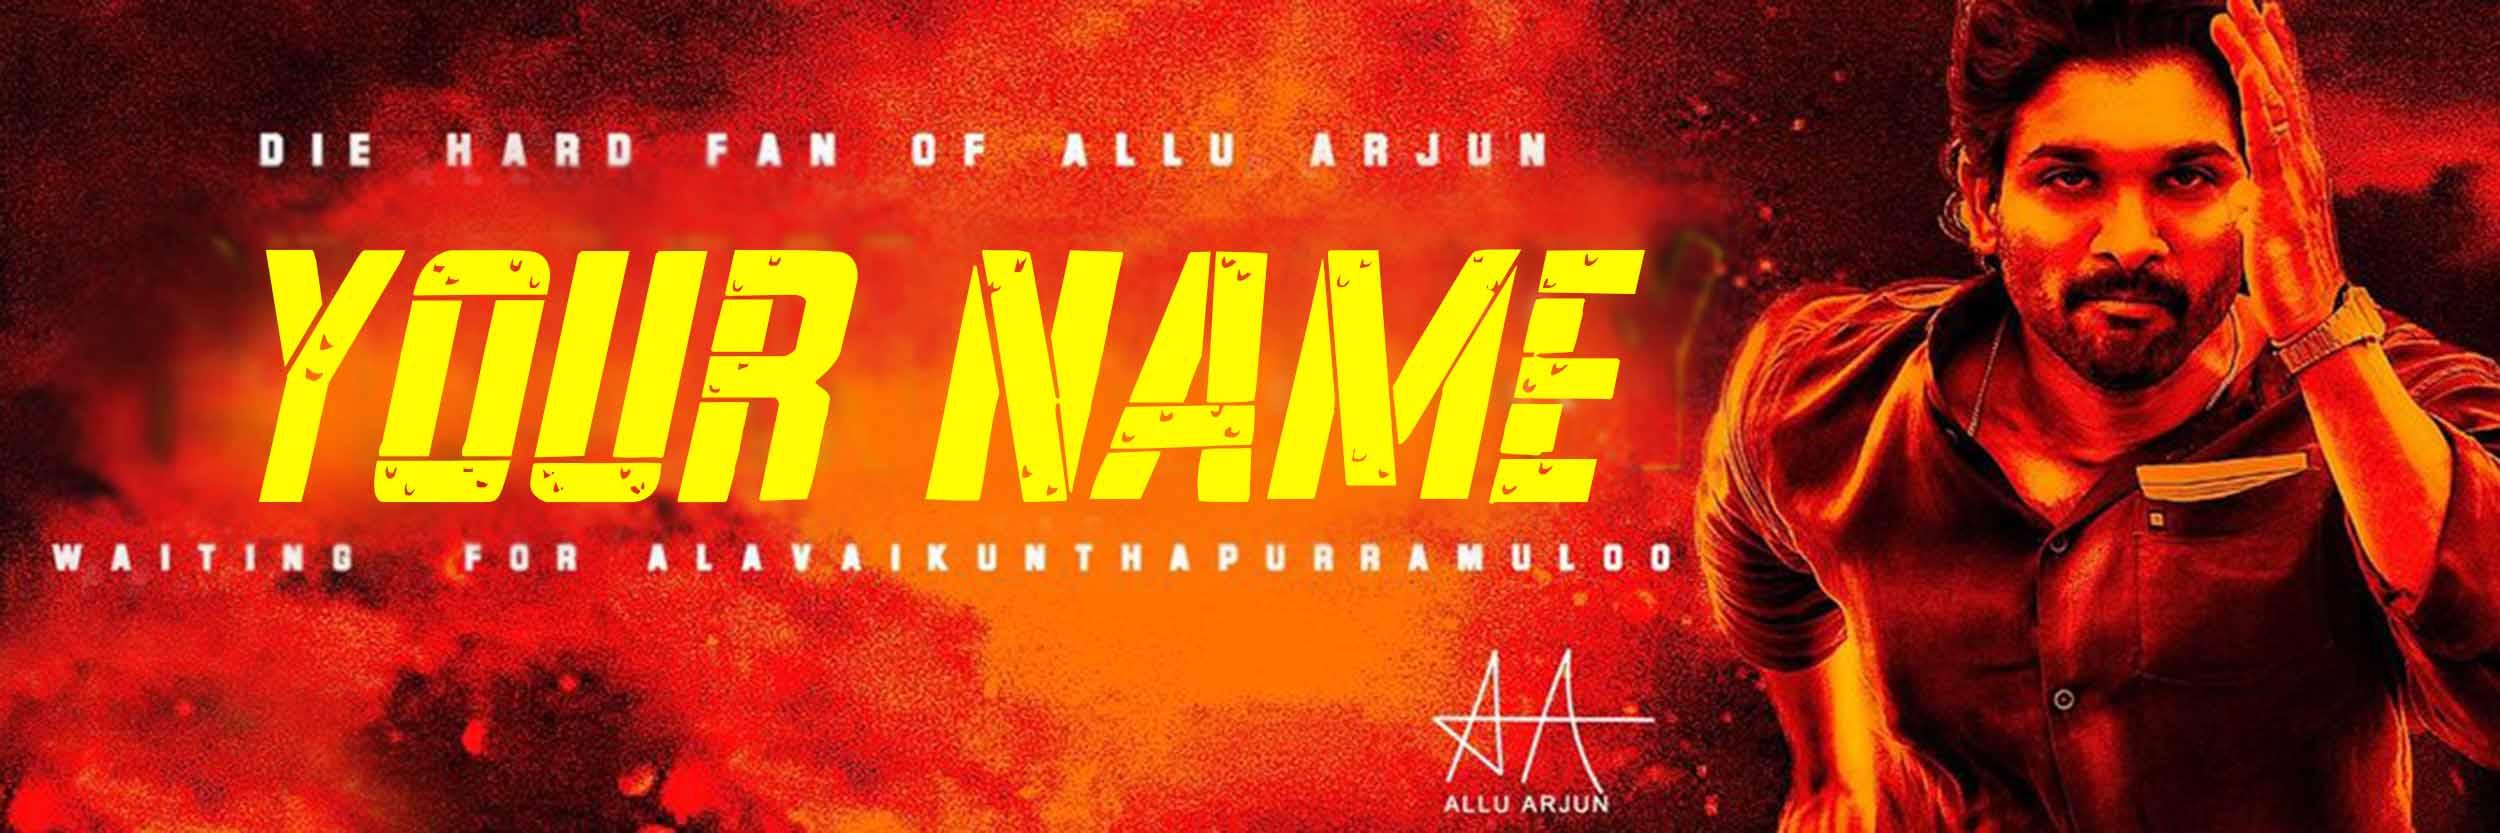 Ala Vaikunthapurramloo Movie Common Cover Picture Font Generator